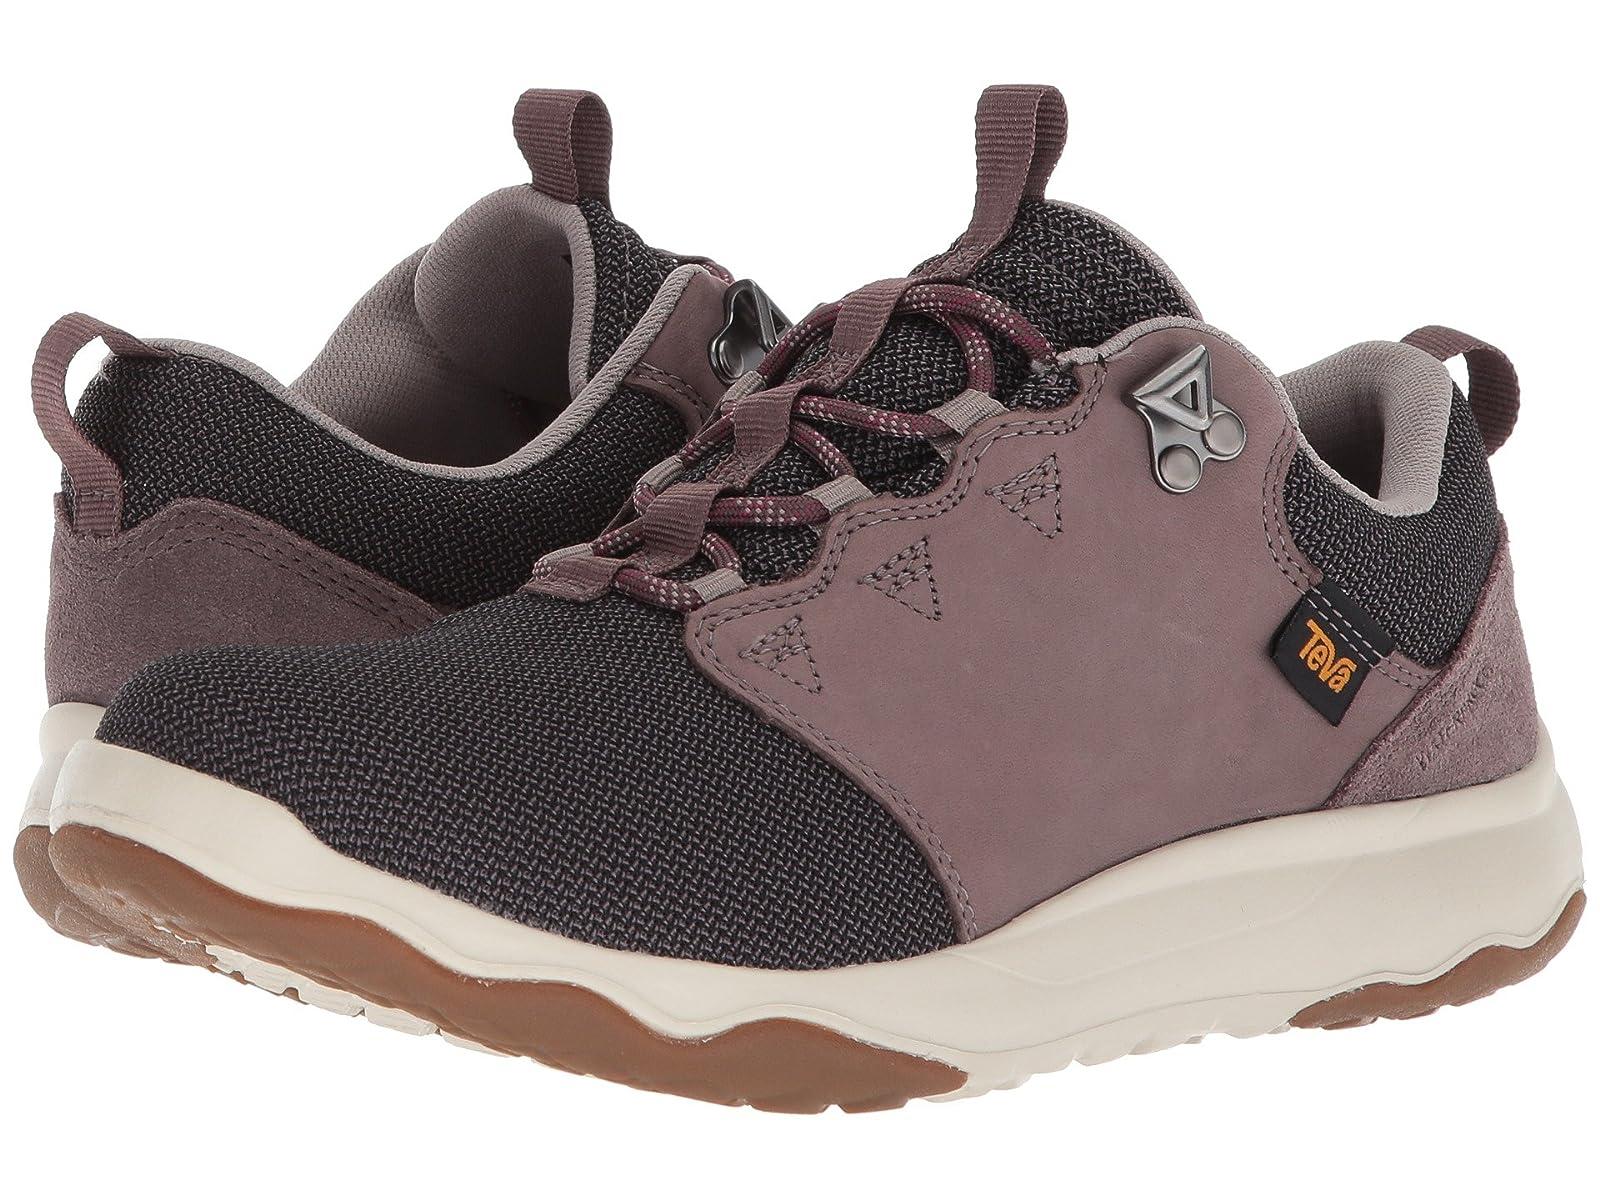 Teva Arrowood WPCheap and distinctive eye-catching shoes